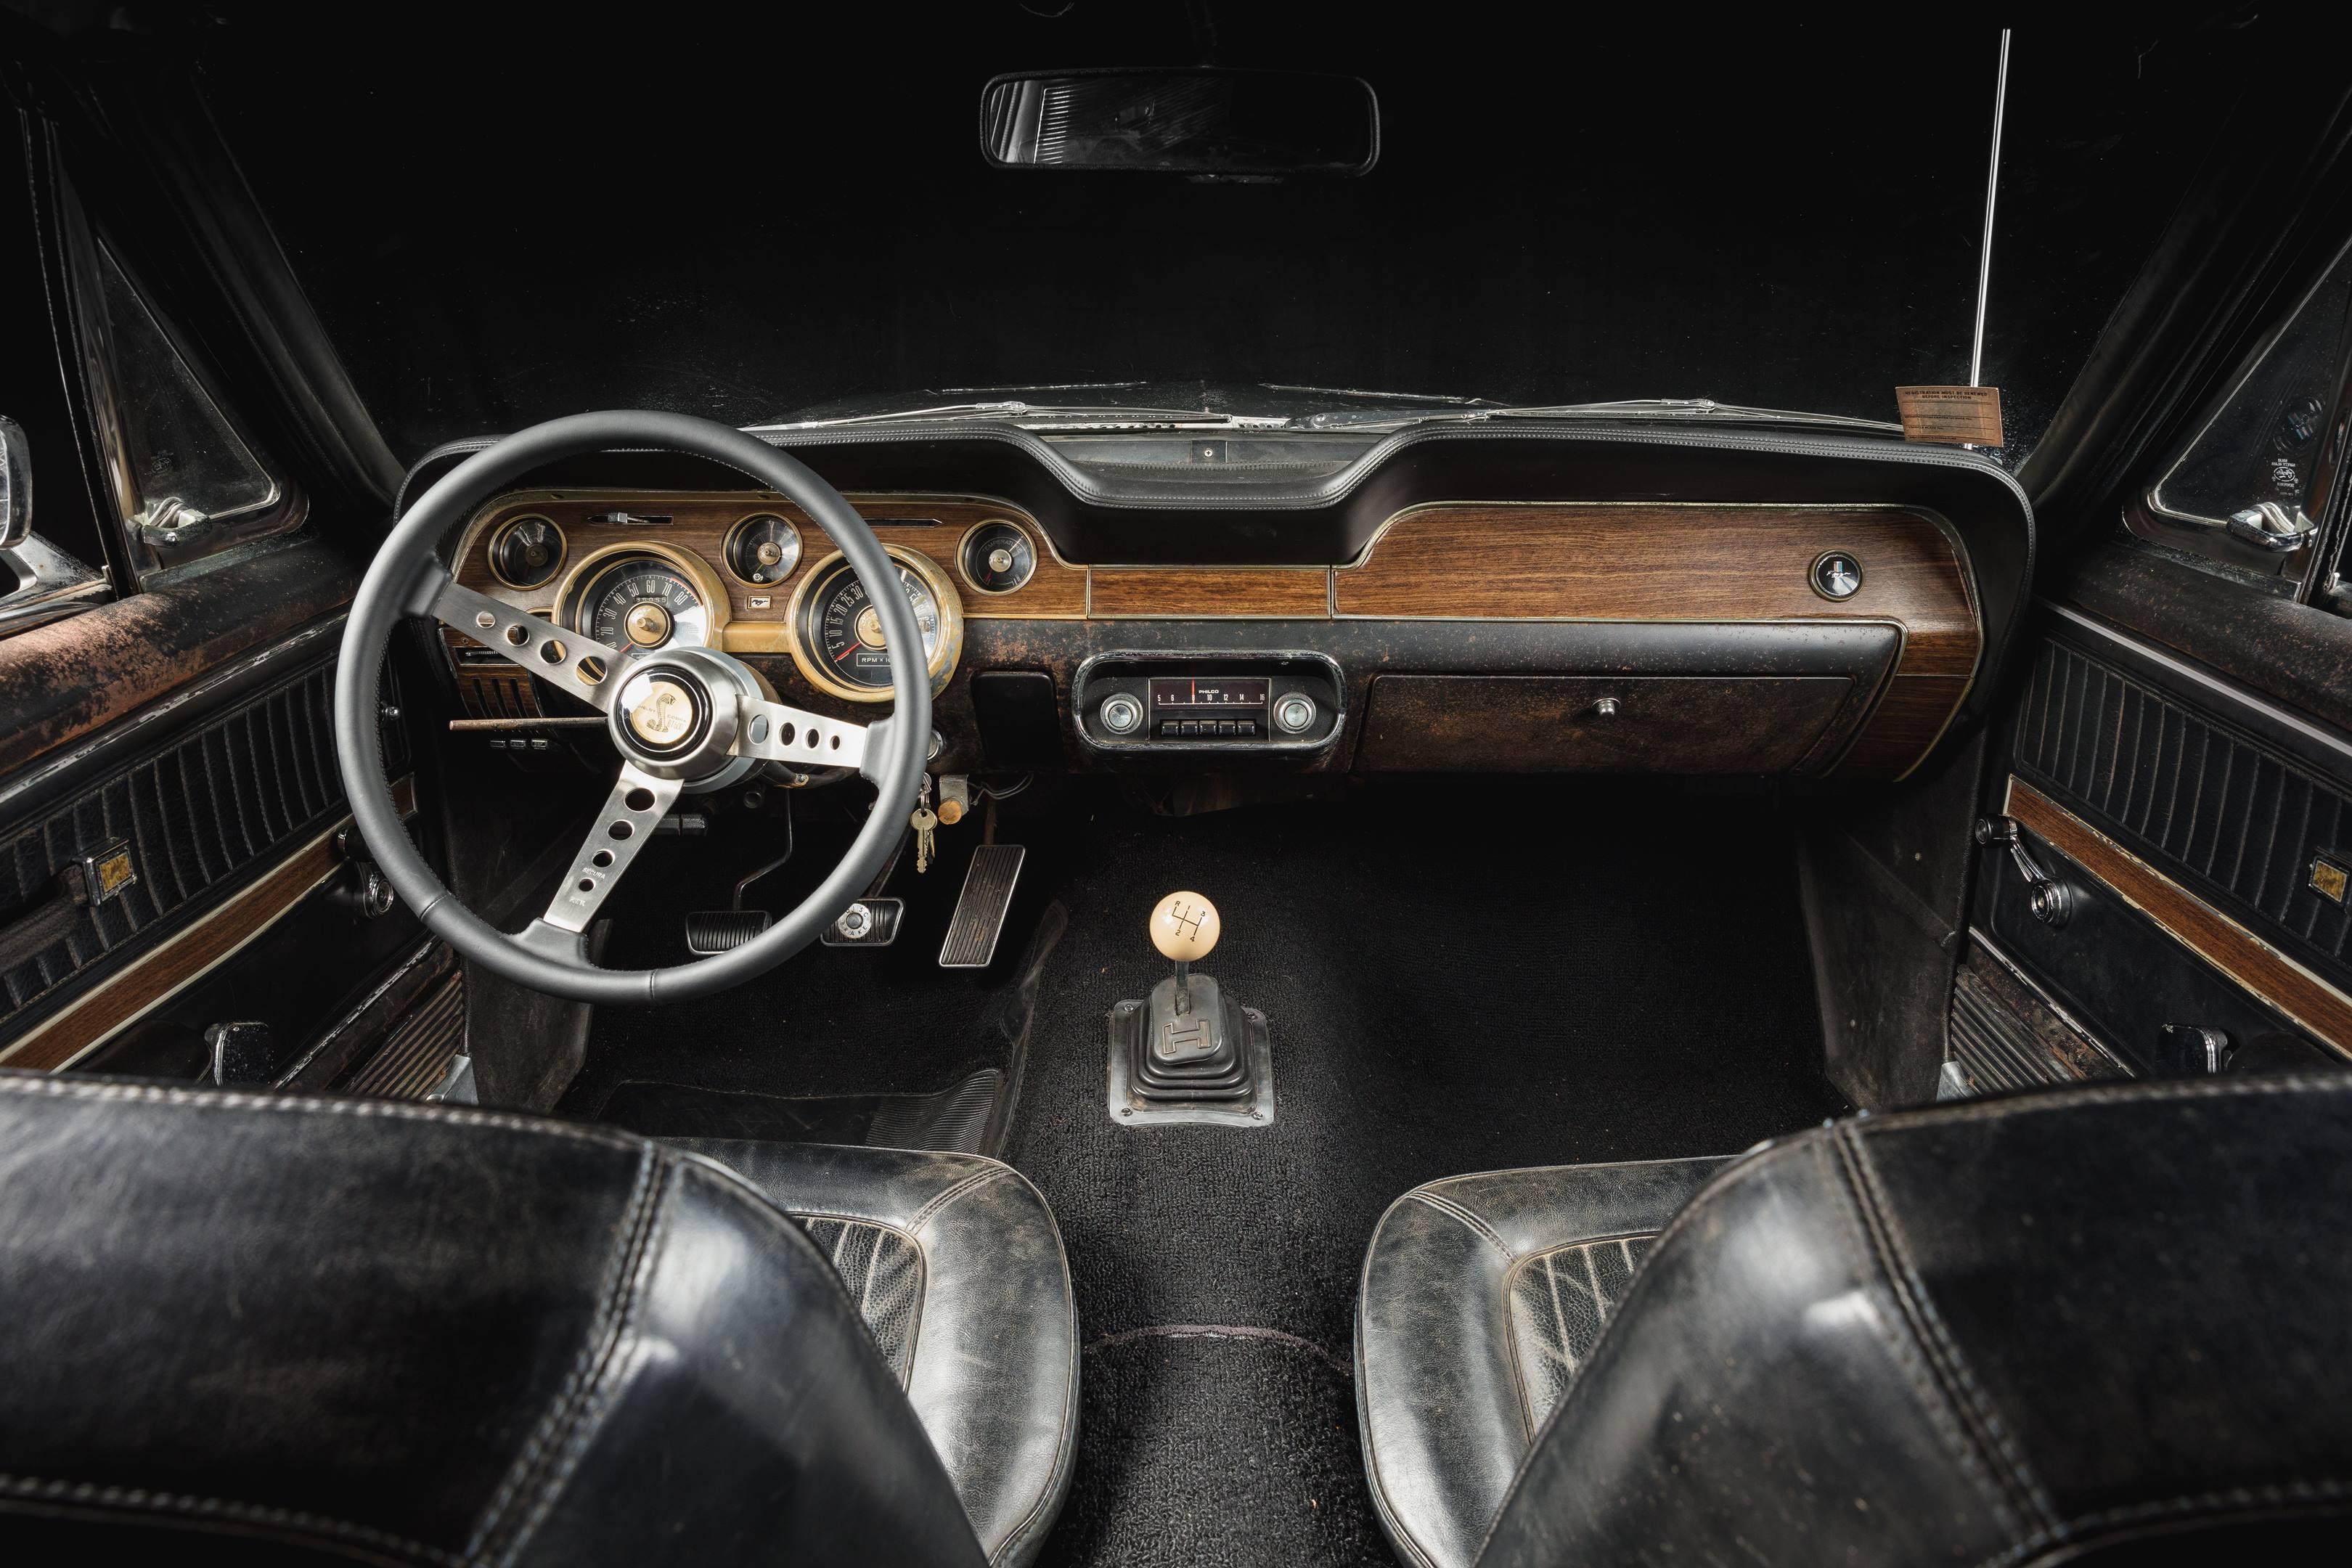 Bullitt Mustang interior from the back seat